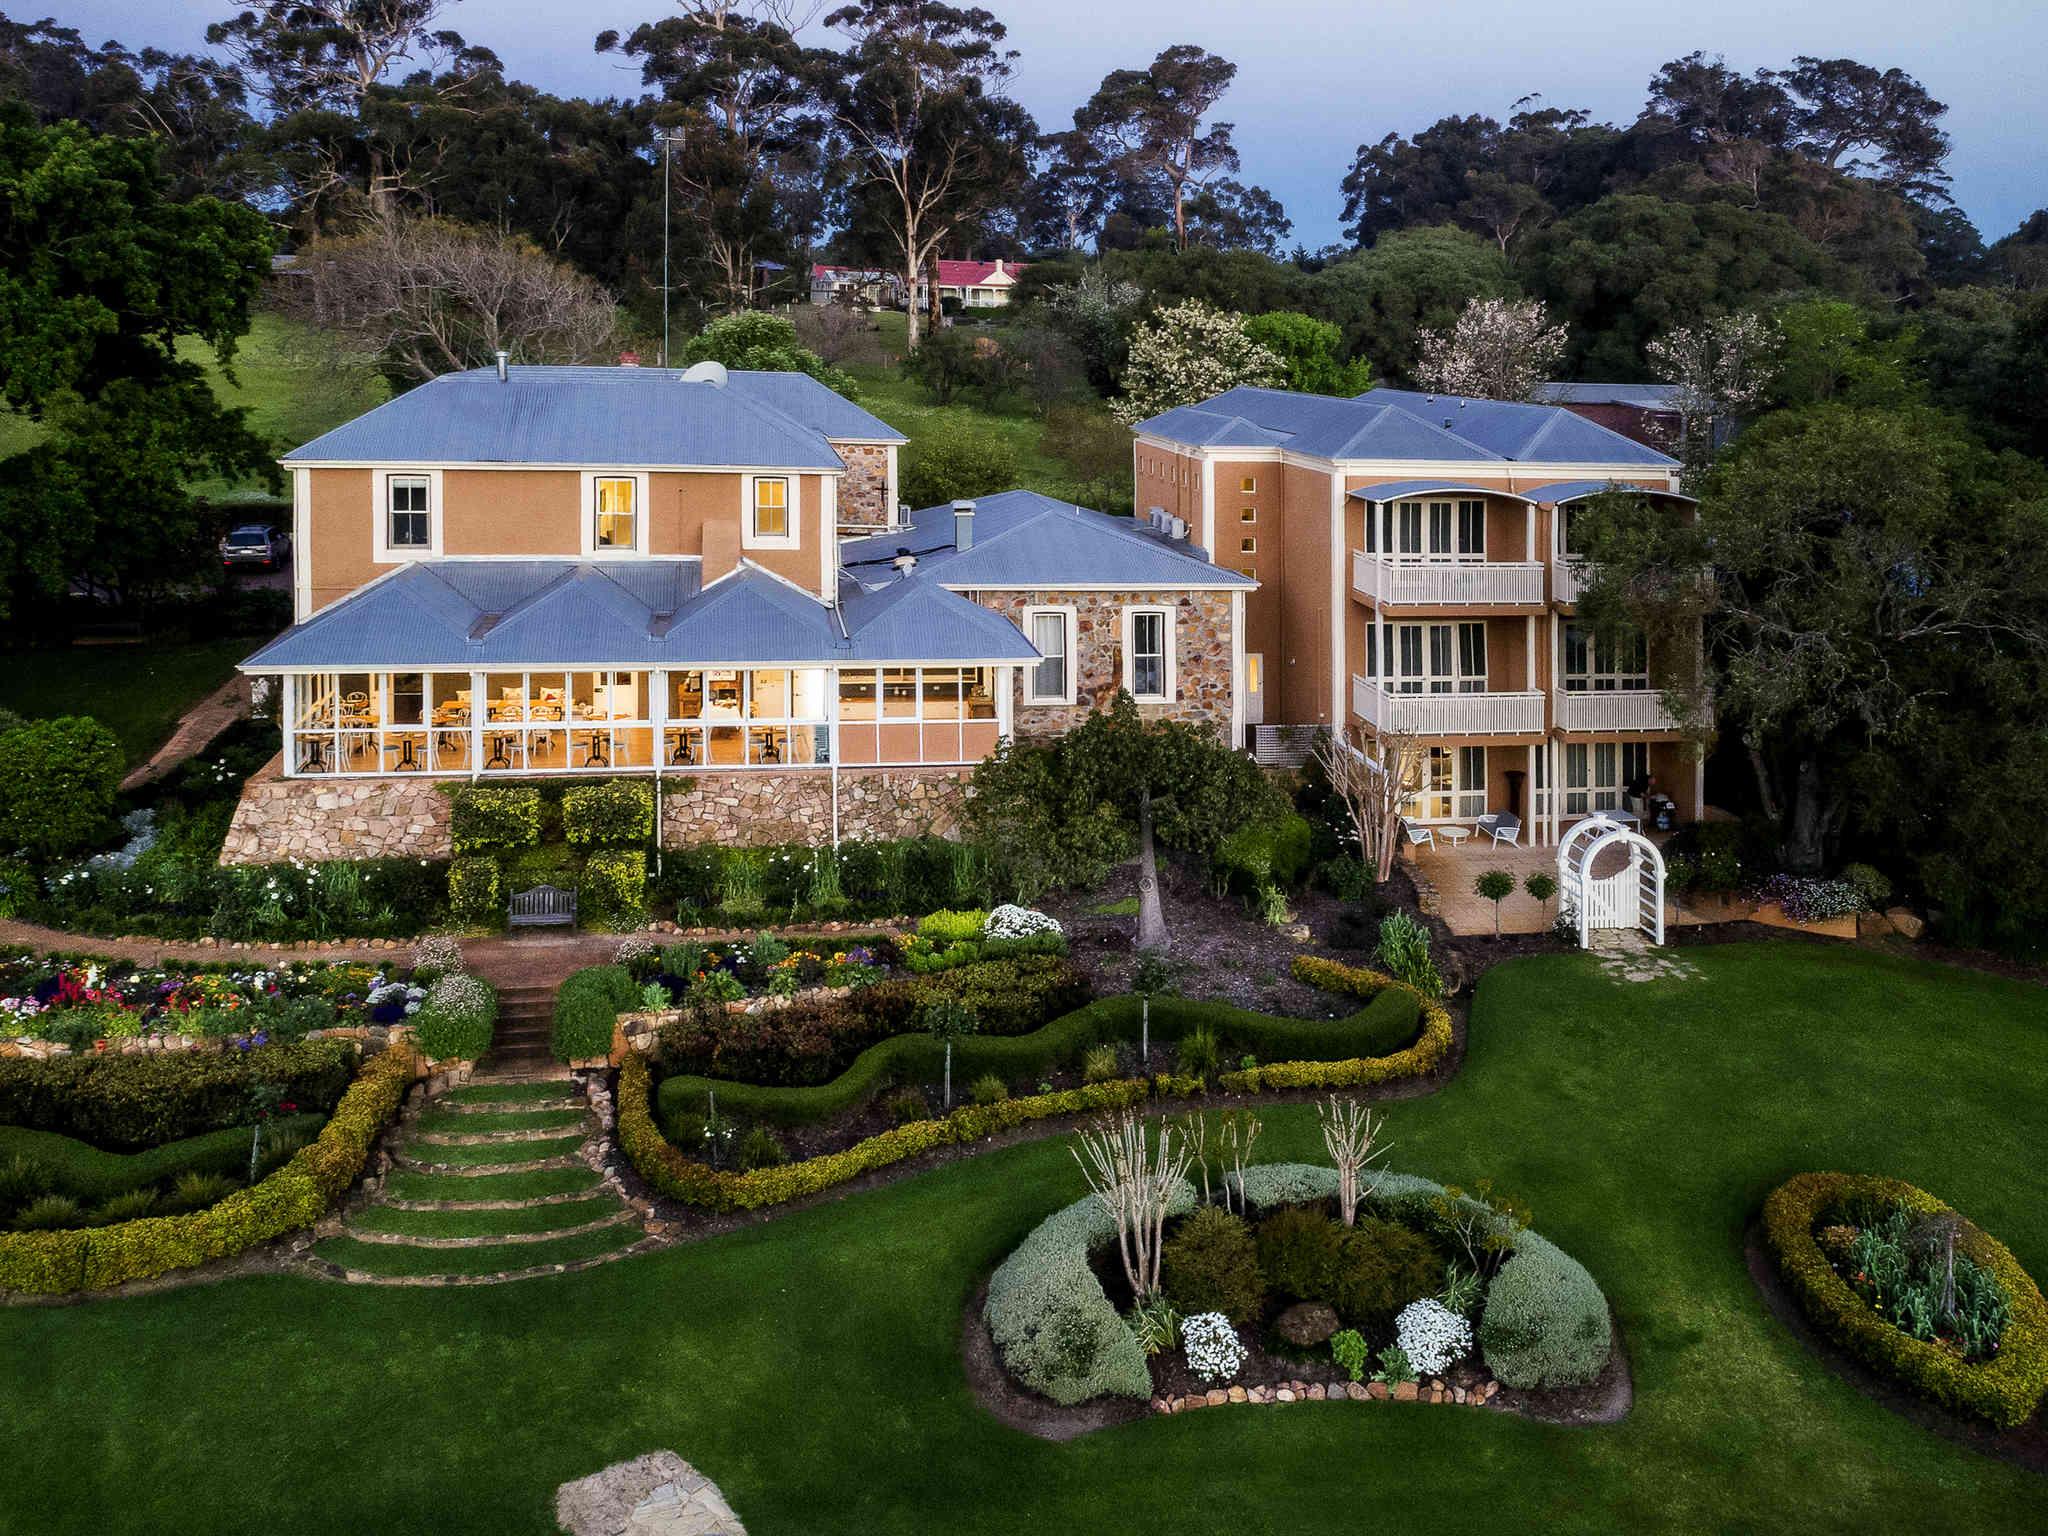 Hotel – Grand Mercure Basildene Manor Accor Vacation Club Apartments